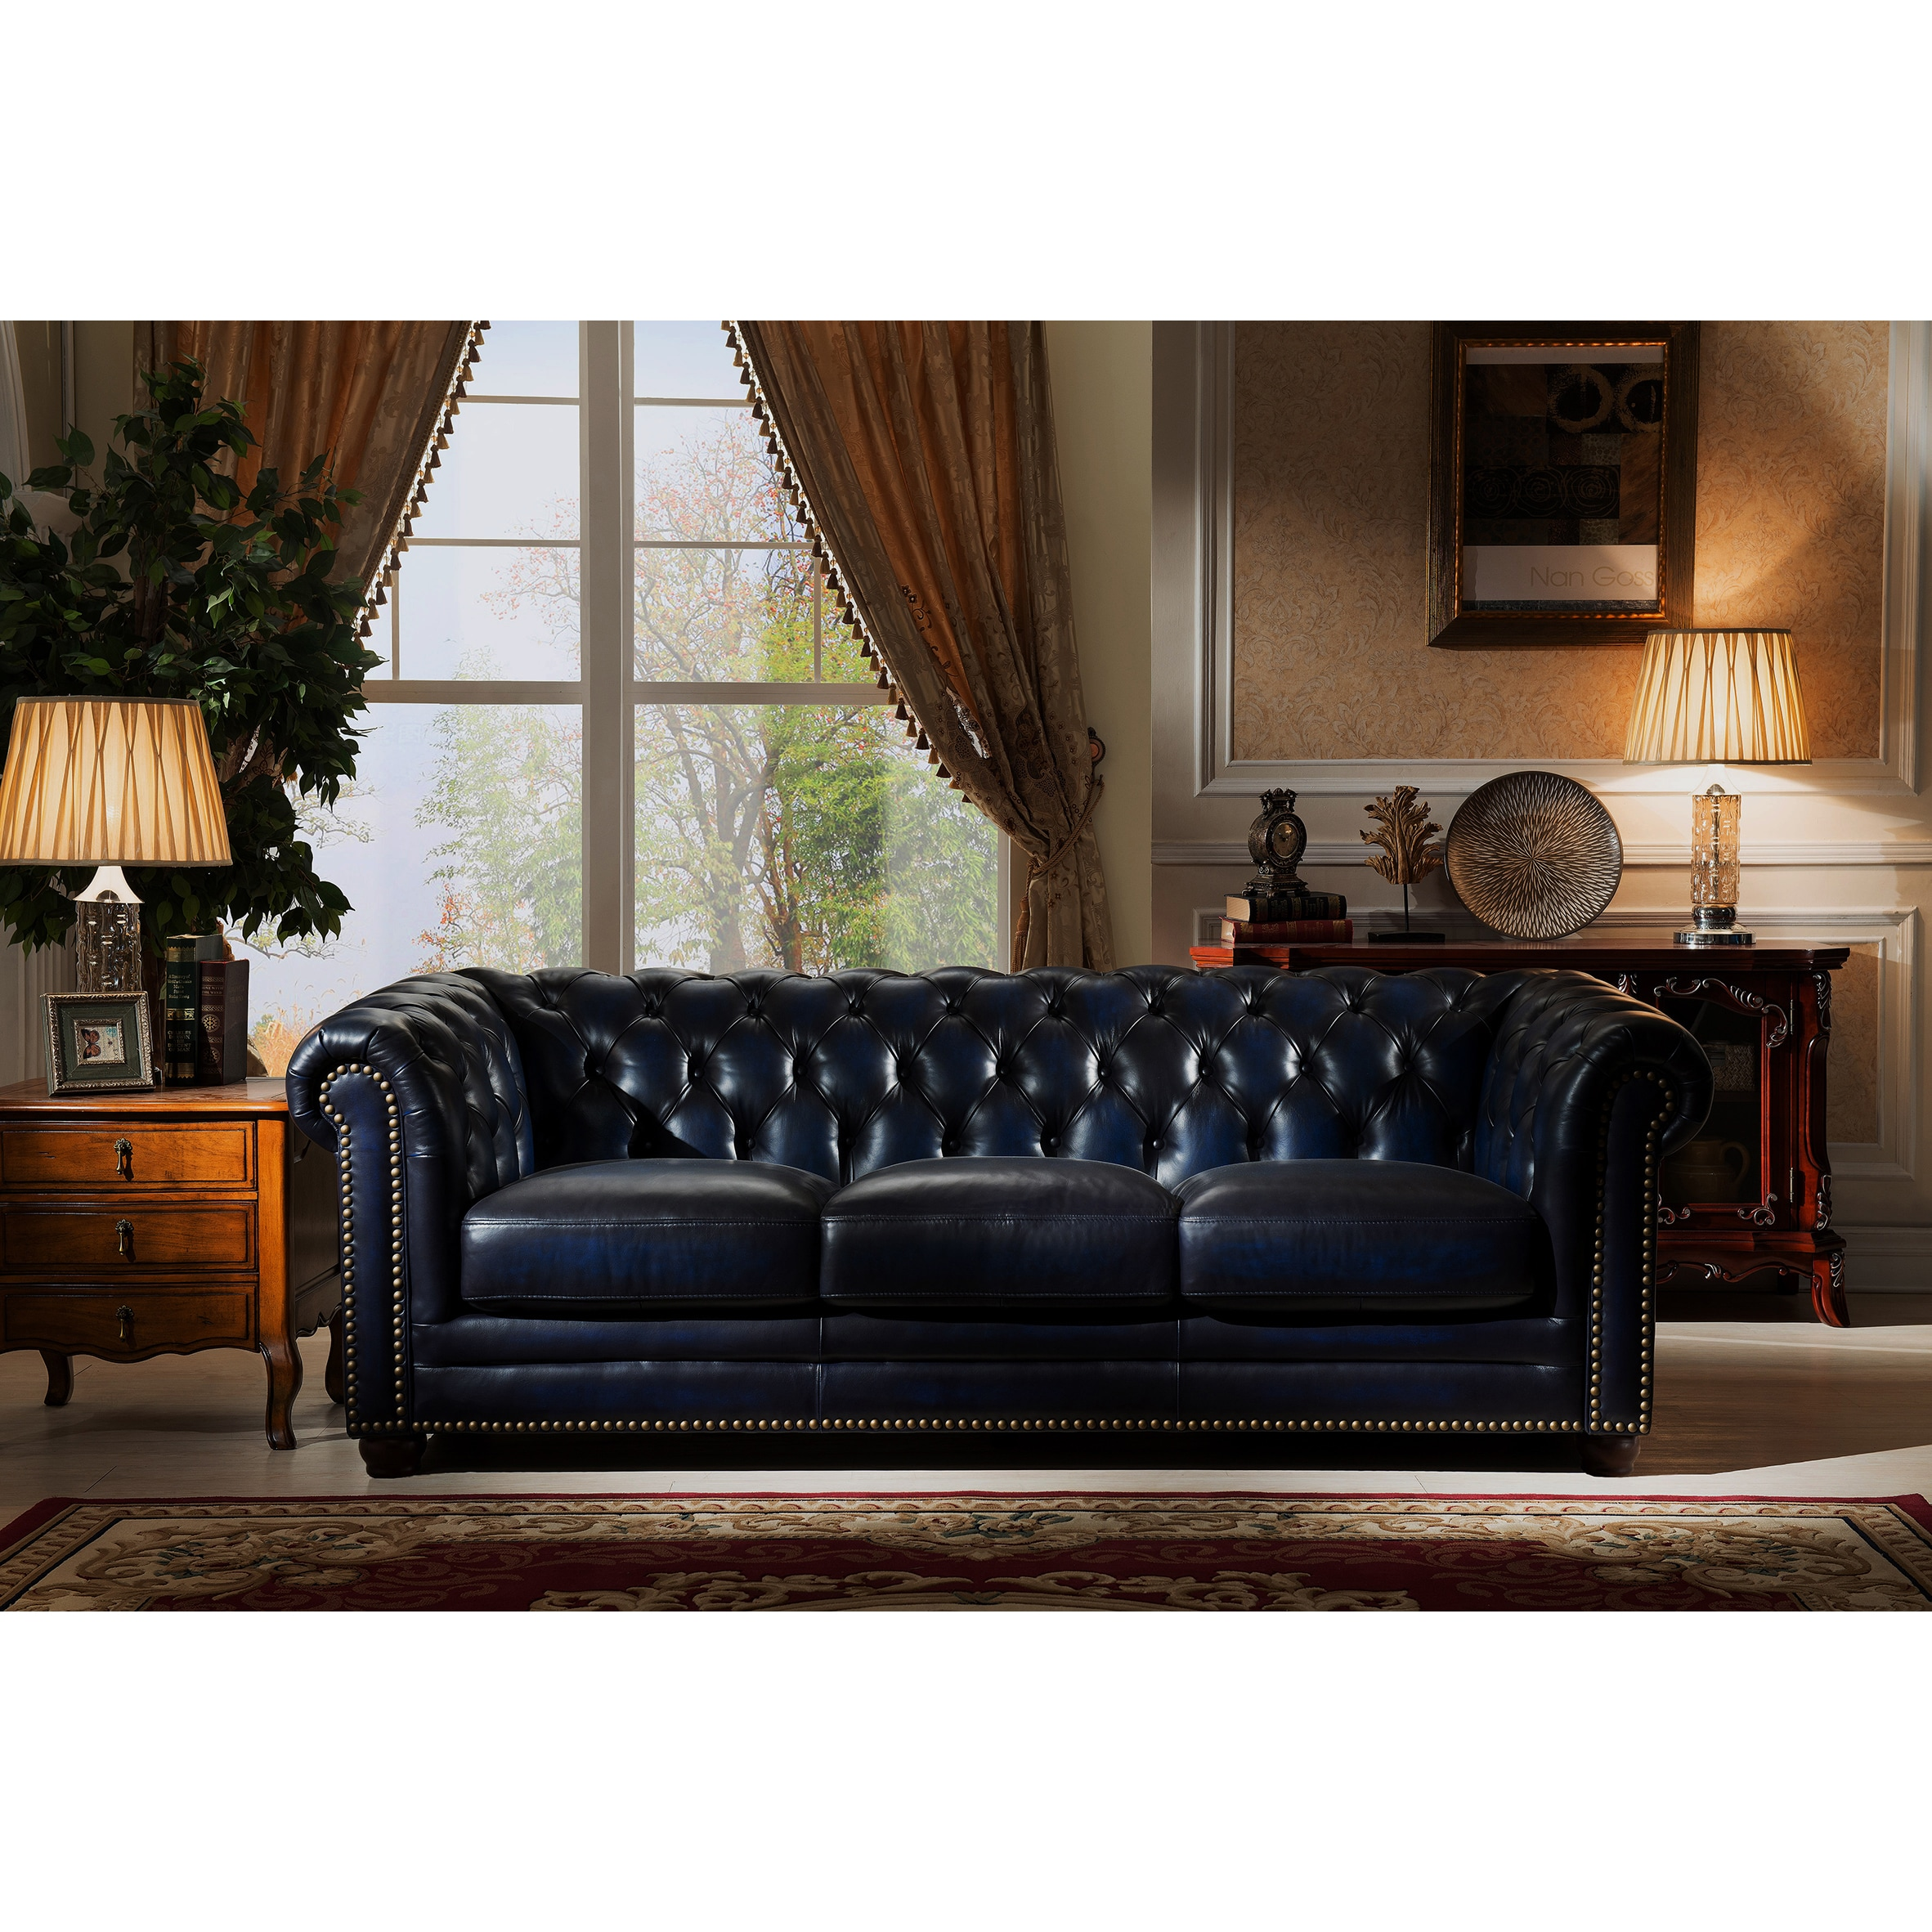 Nebraska Navy Blue Genuine Hand Rubbed Leather Chesterfield Sofa And Loveseat Set